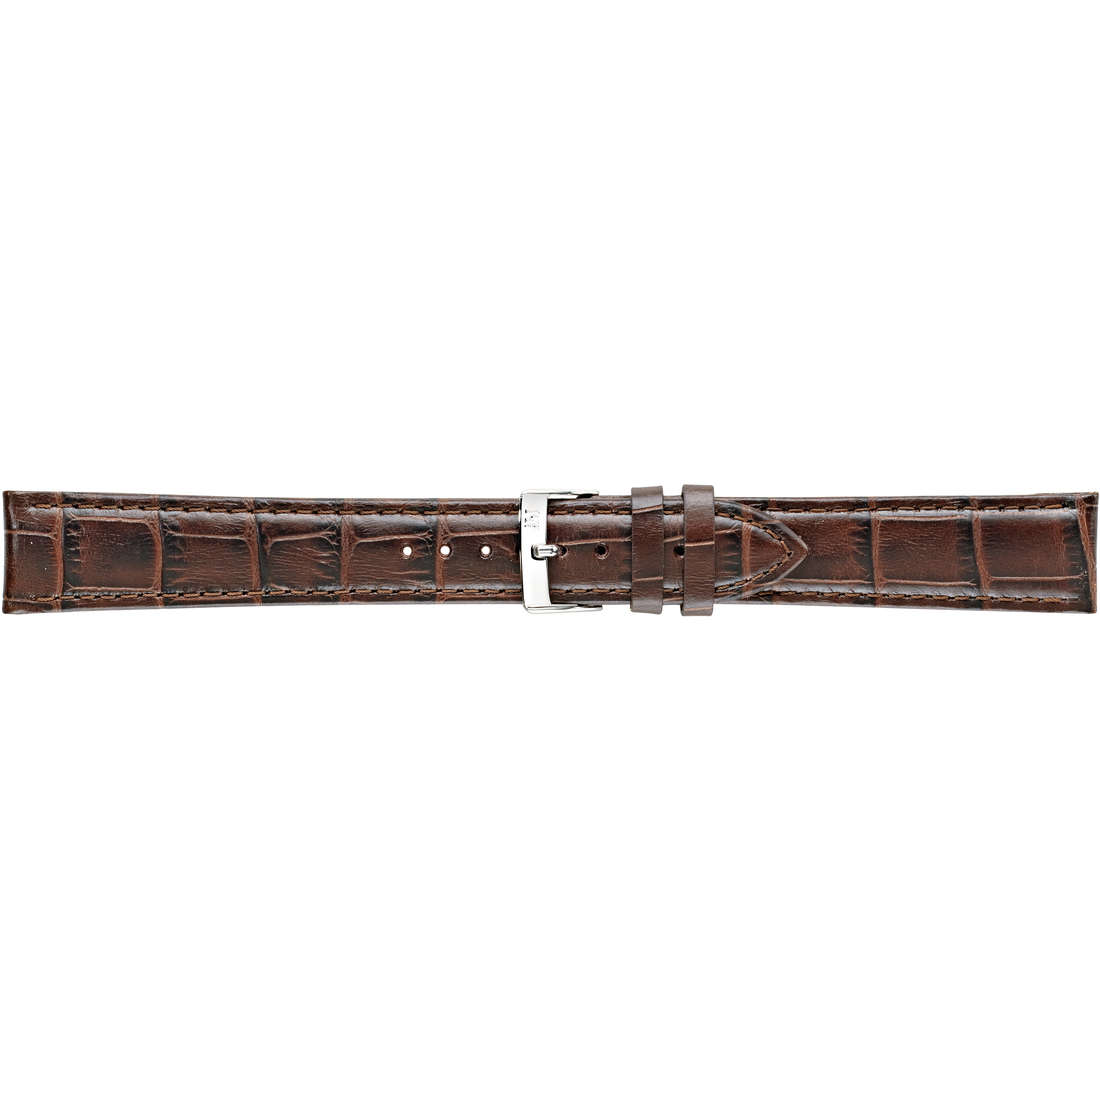 montre bande de montres unisex Morellato I Lunghi A01Y2269480032CR24